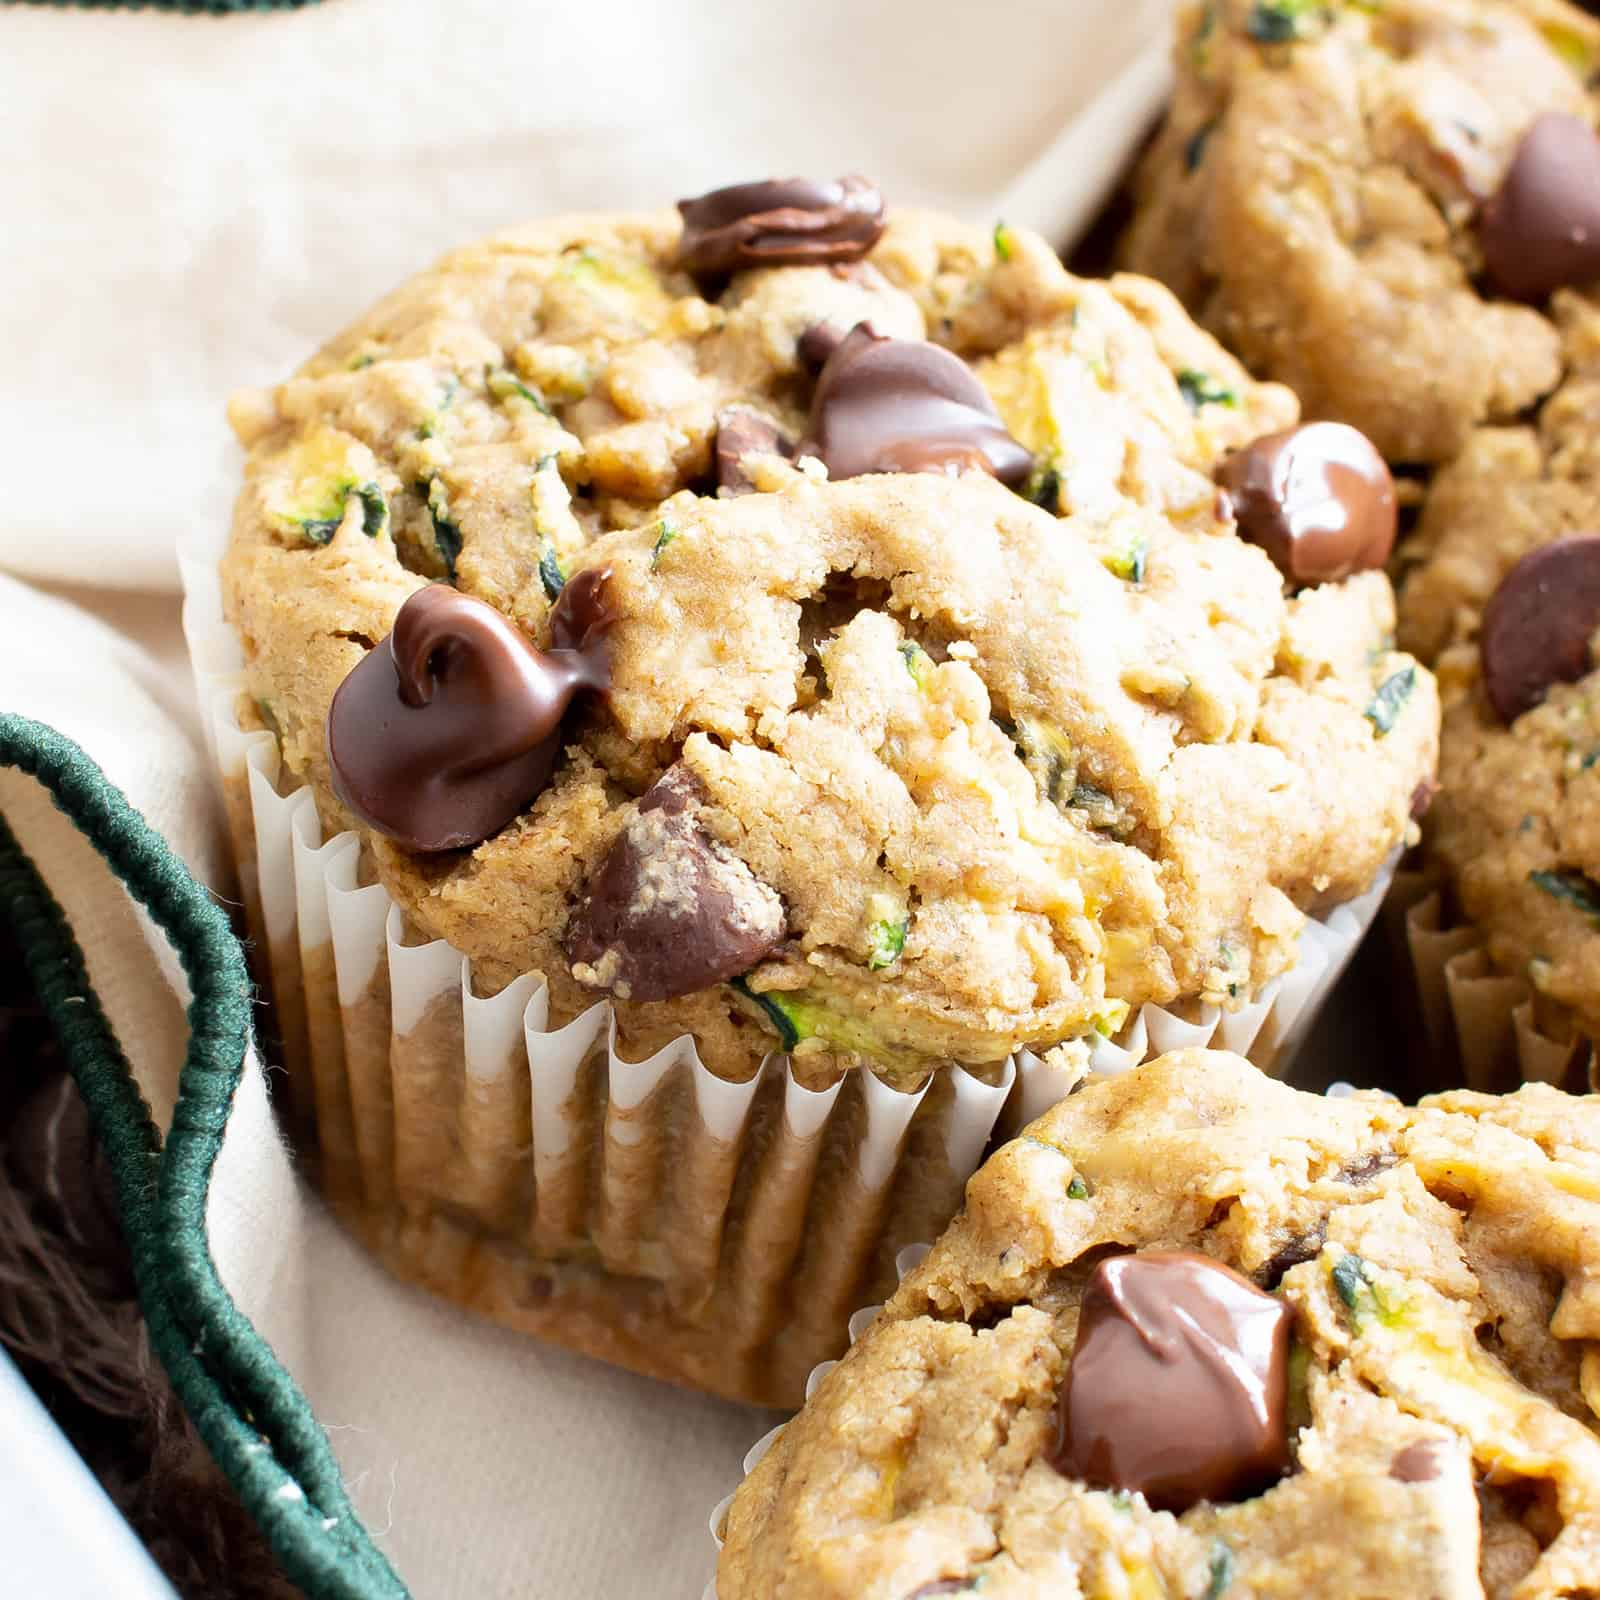 Healthy Moist Vegan Zucchini Muffins w/ Chocolate Chips (GF, V): this healthy zucchini muffins recipe is buttery, moist & fluffy! The best gluten free vegan zucchini muffins—egg free, easy & packed with chocolate! #Zucchini #Muffins #Vegan #GlutenFree #Healthy | Recipe at BeamingBaker.com